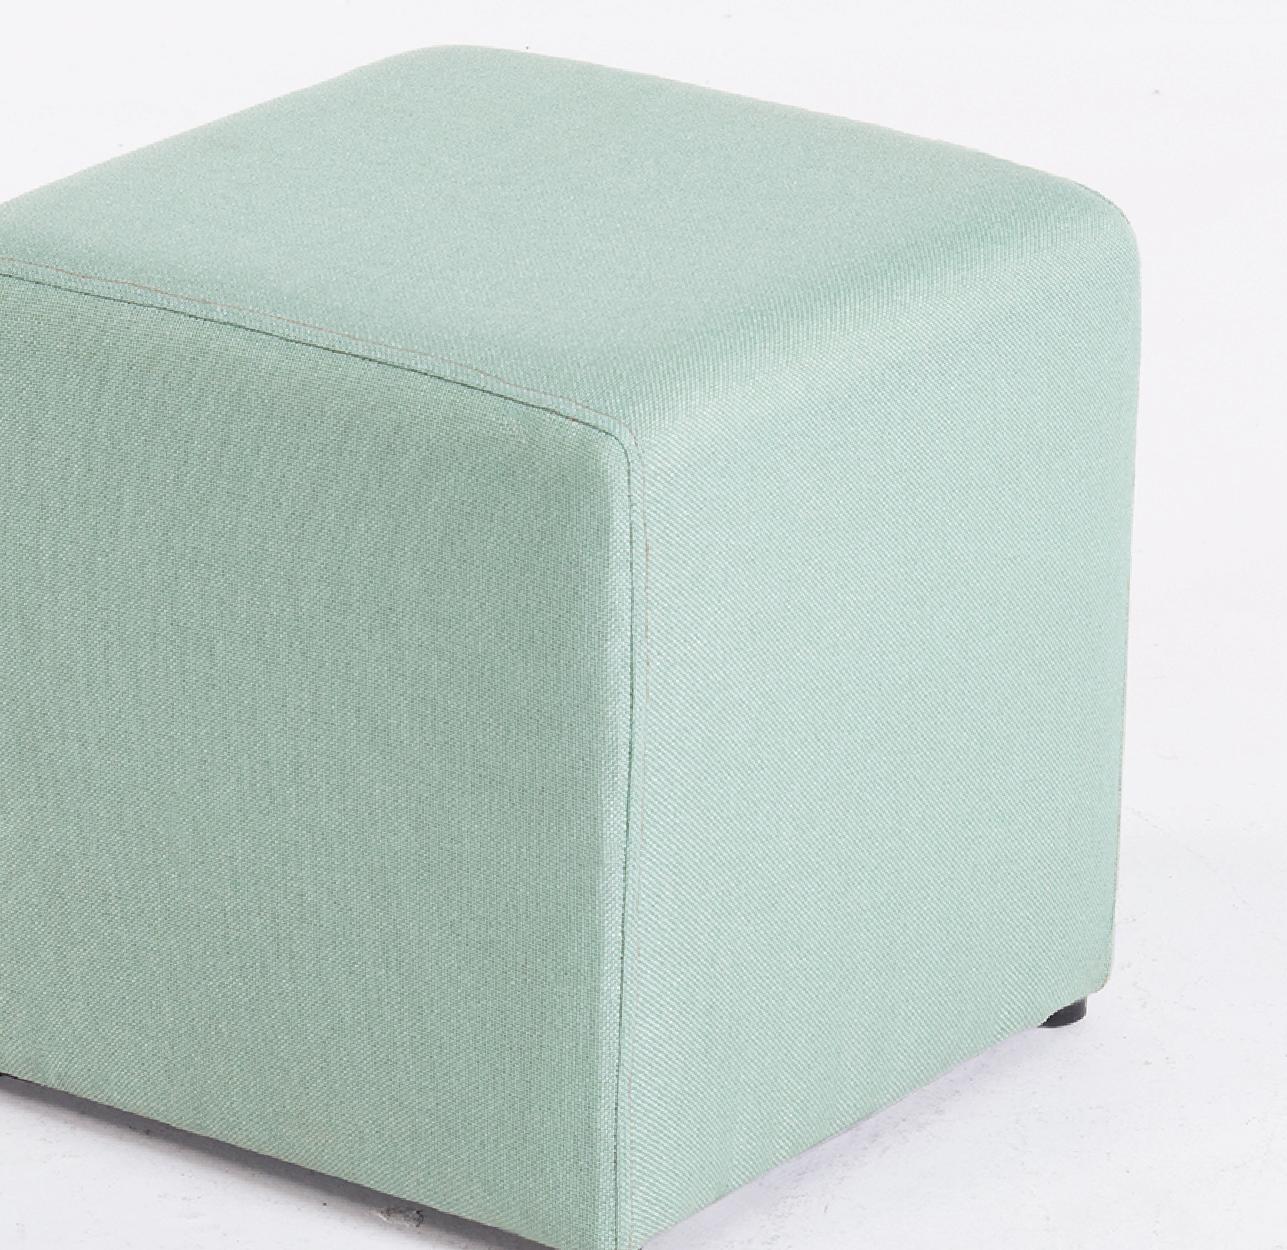 Amazon Com Belleze Modern Cube Ottoman Fabric Upholstered